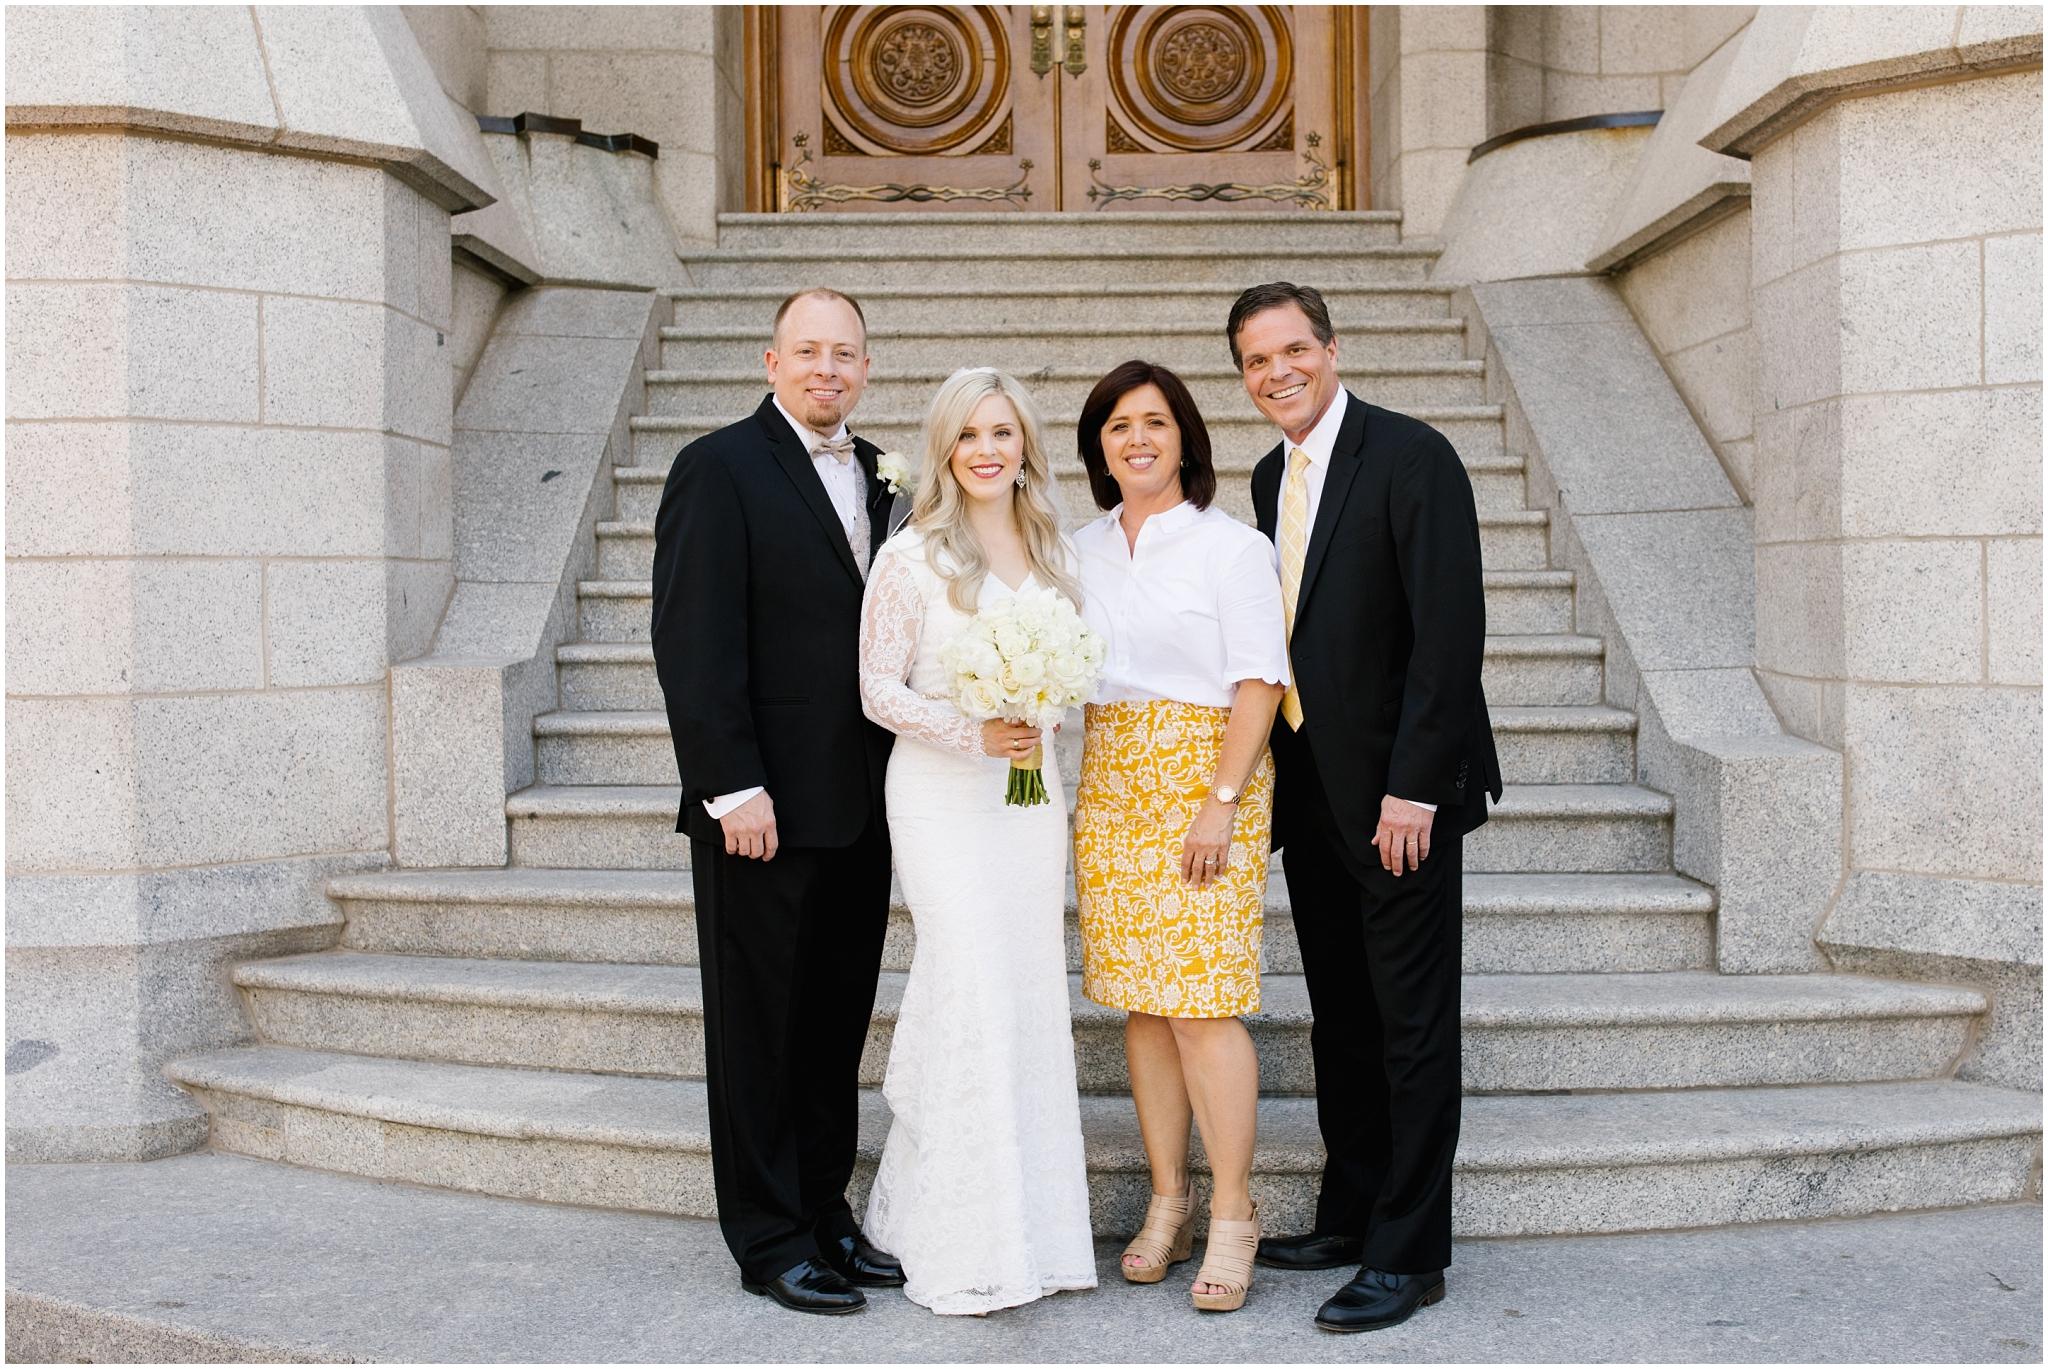 CherylandTyler-96_Lizzie-B-Imagery-Utah-Wedding-Photographer-Salt-Lake-City-Temple-Wells-Fargo-Building-Reception.jpg